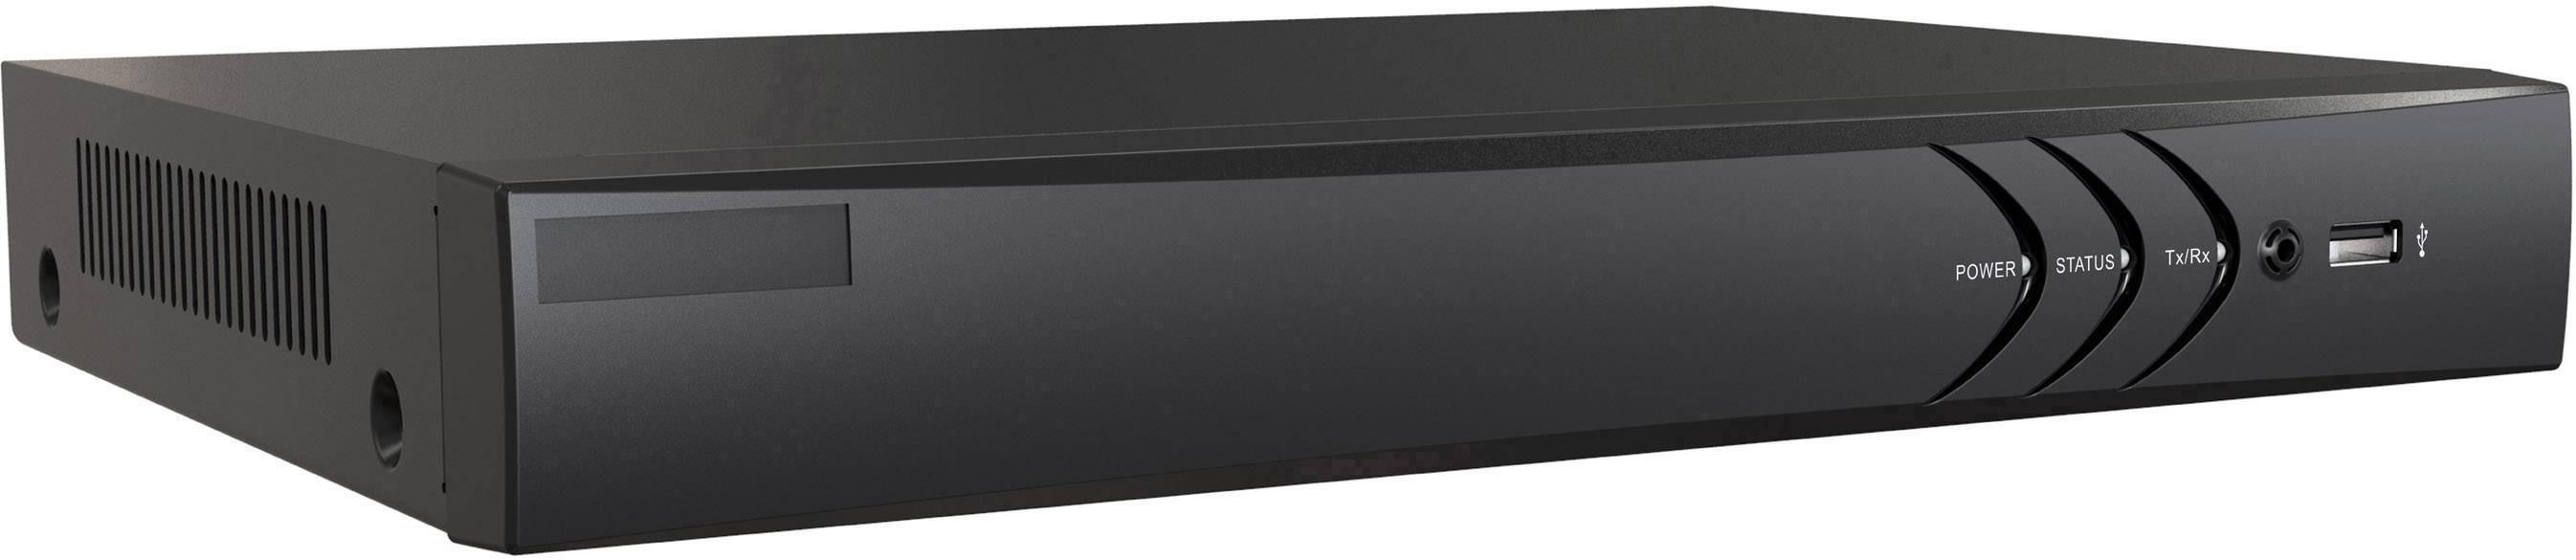 HiWatch DS-H204U DS-H204U 4 canali (AHD, HD-CVI, HD-TVI, Analogico, IP) Registratore digitale HD-SDI